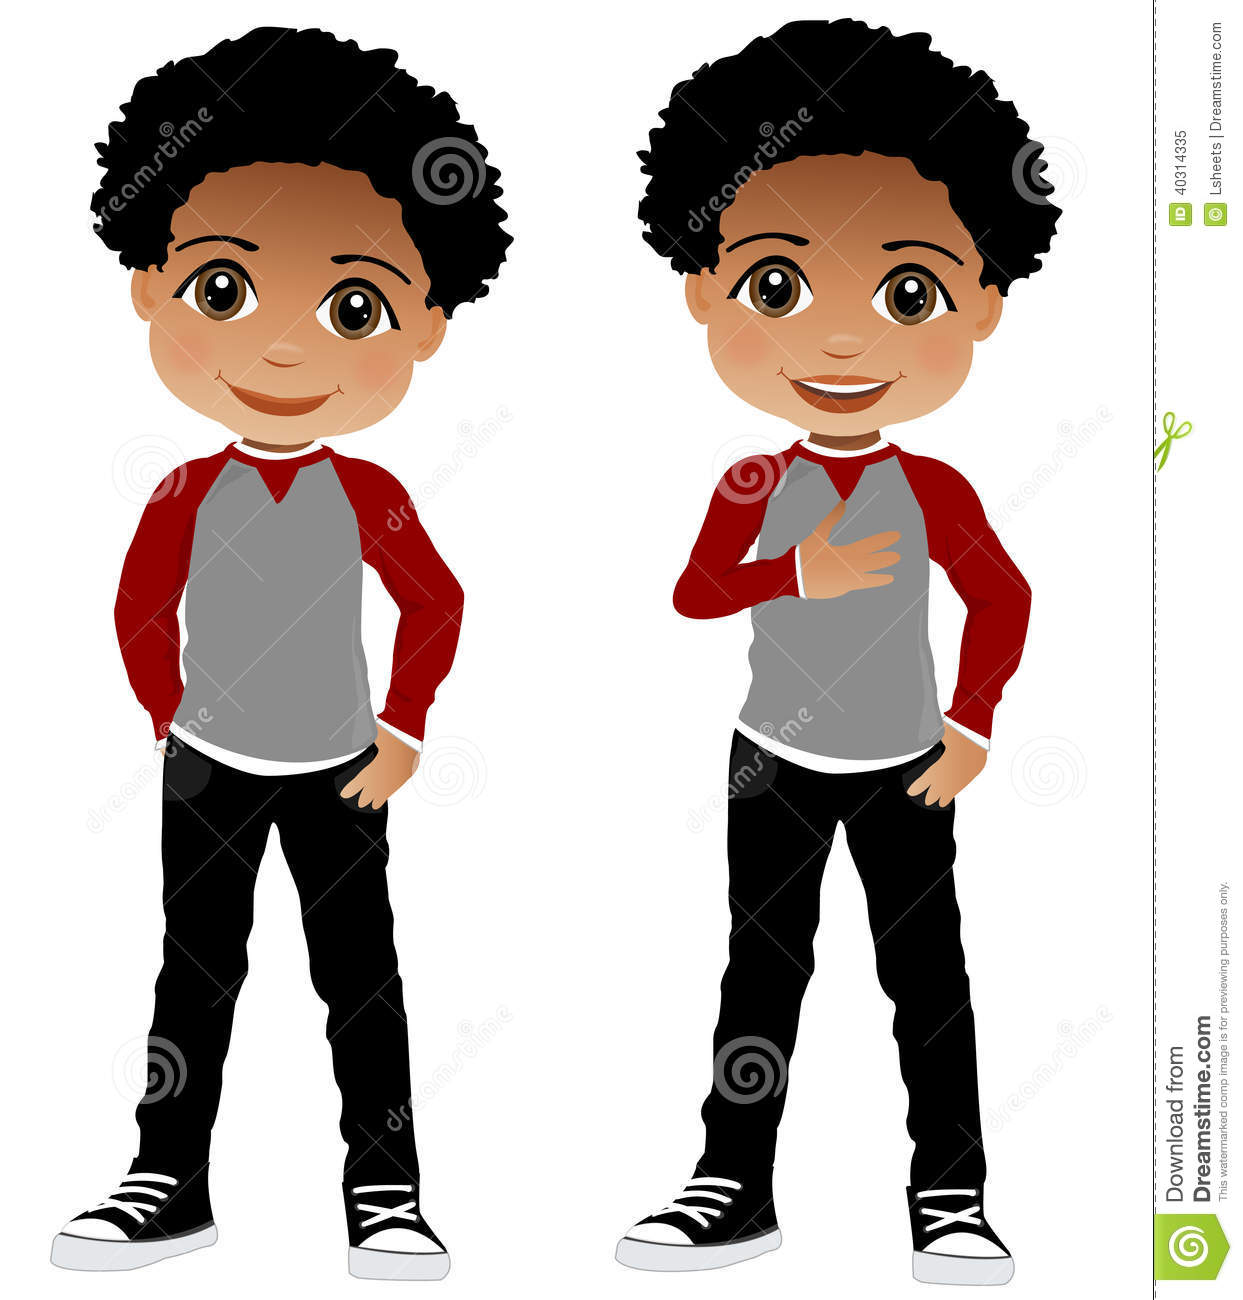 African American Child stock vector. Illustration of children.